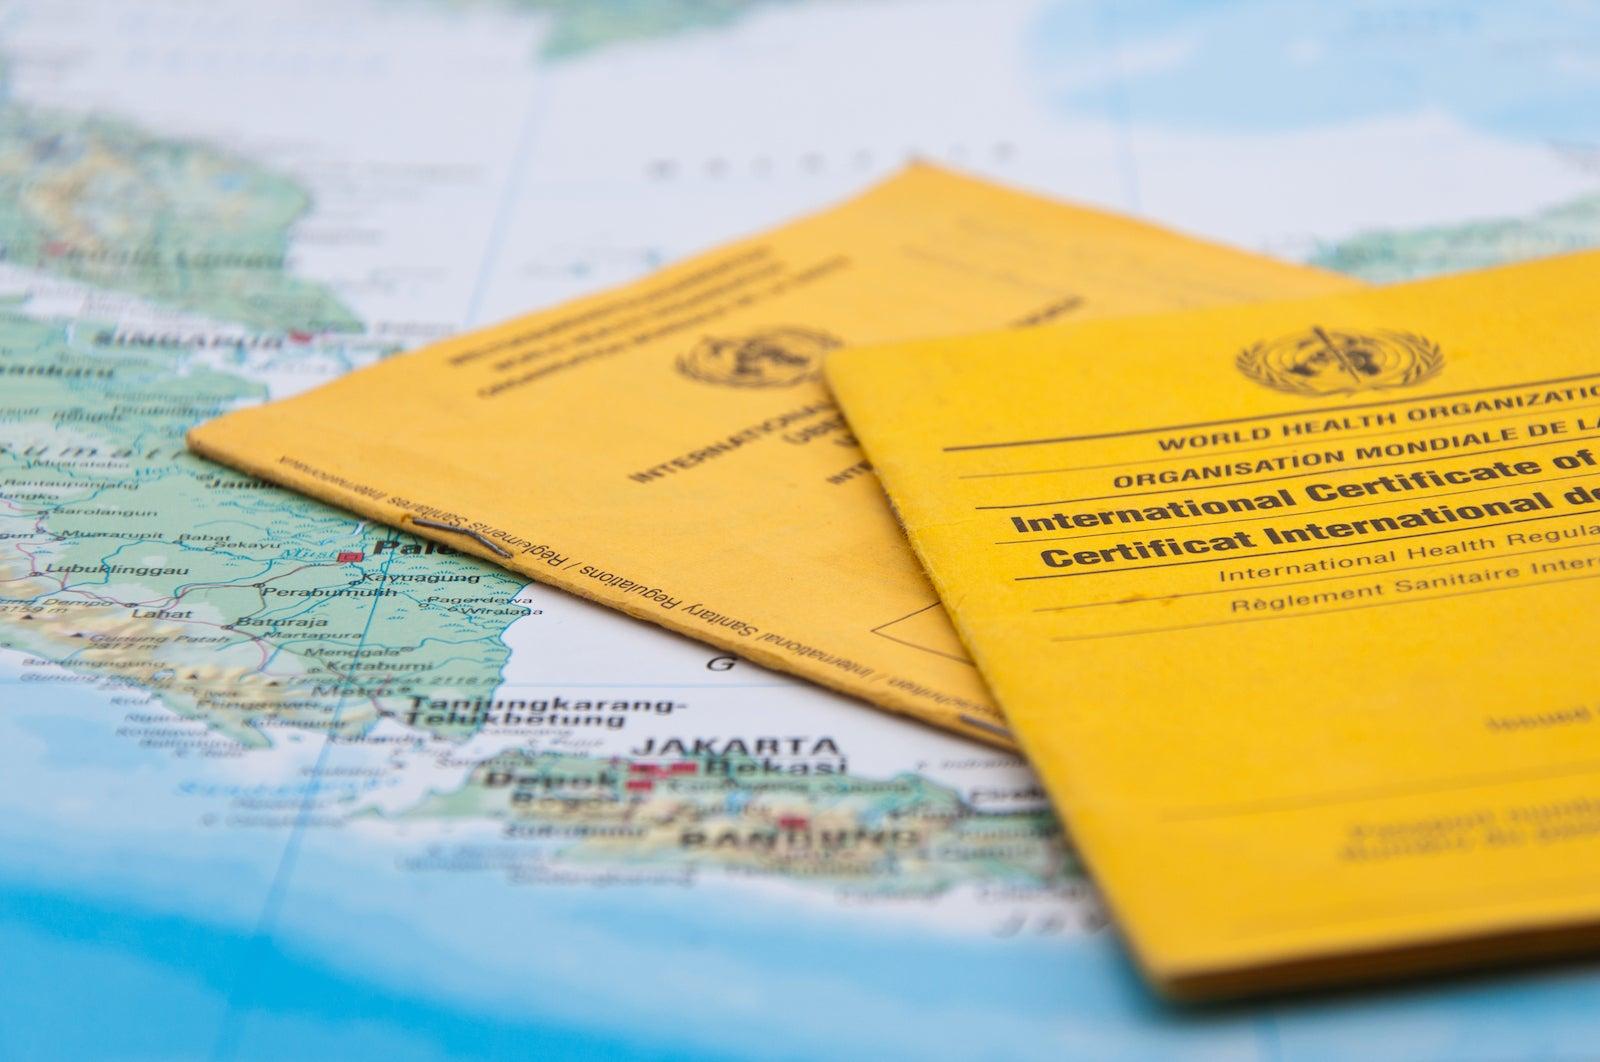 The future of international flying? IATA and Qantas push vaccine passports to restart travel